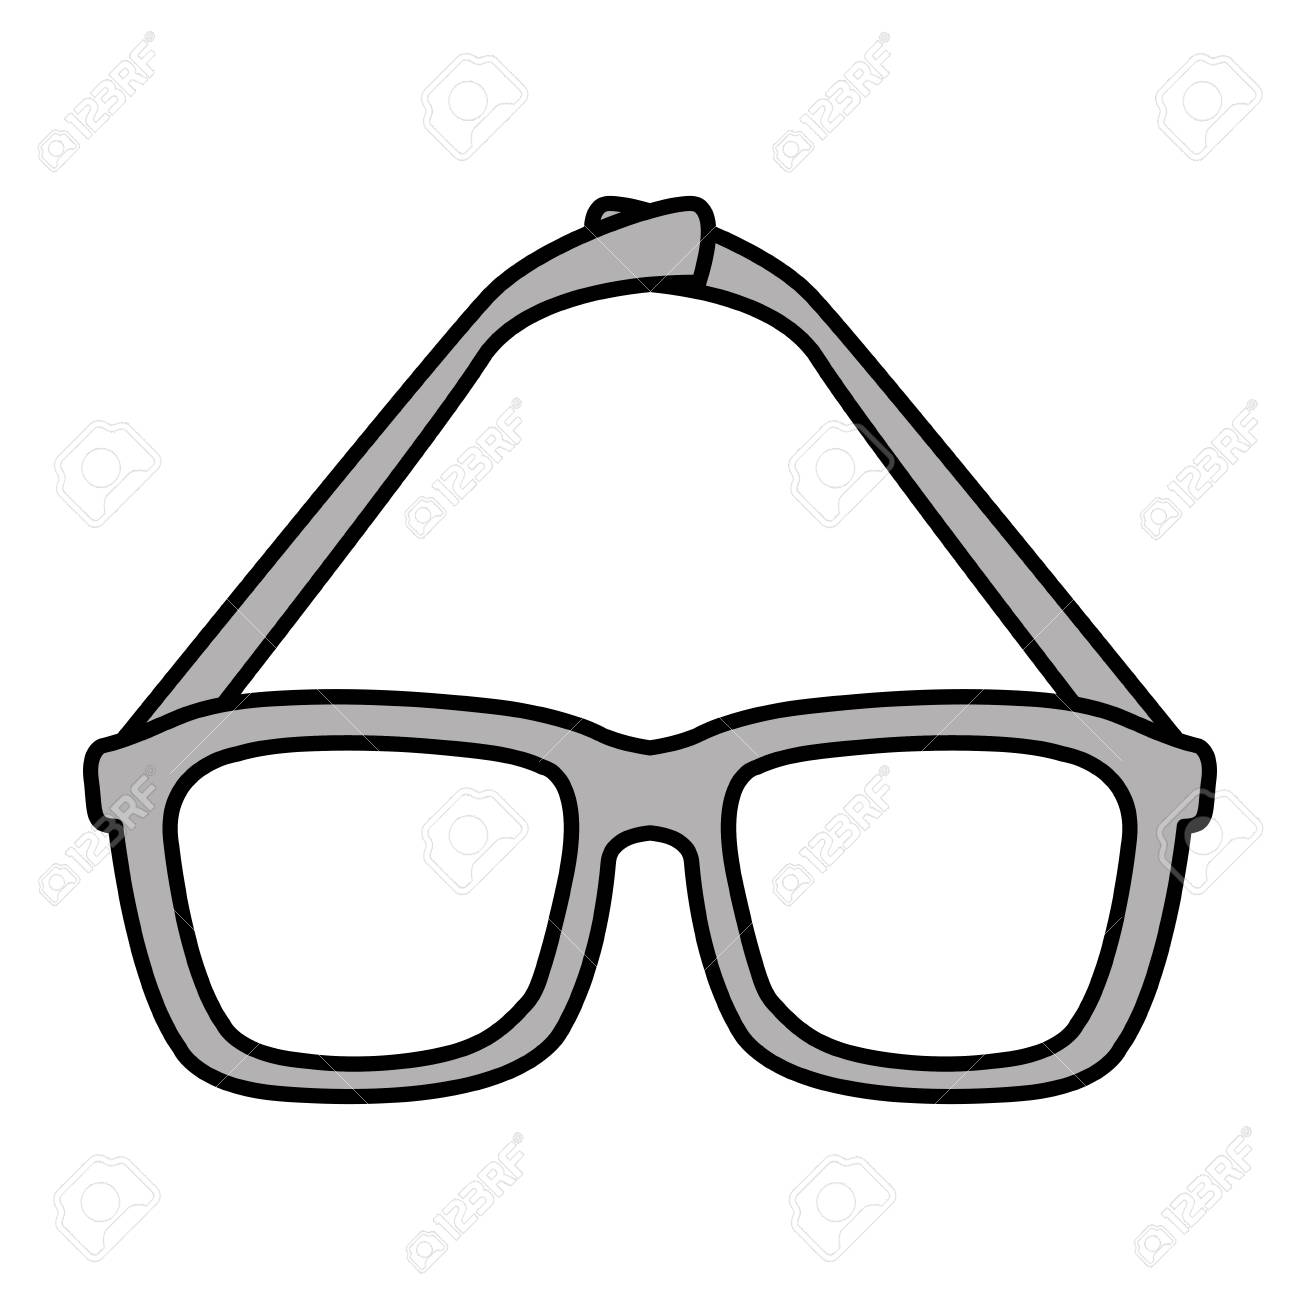 155fed569d75 Eye glasses isolated icon vector illustration design Stock Vector - 97070062